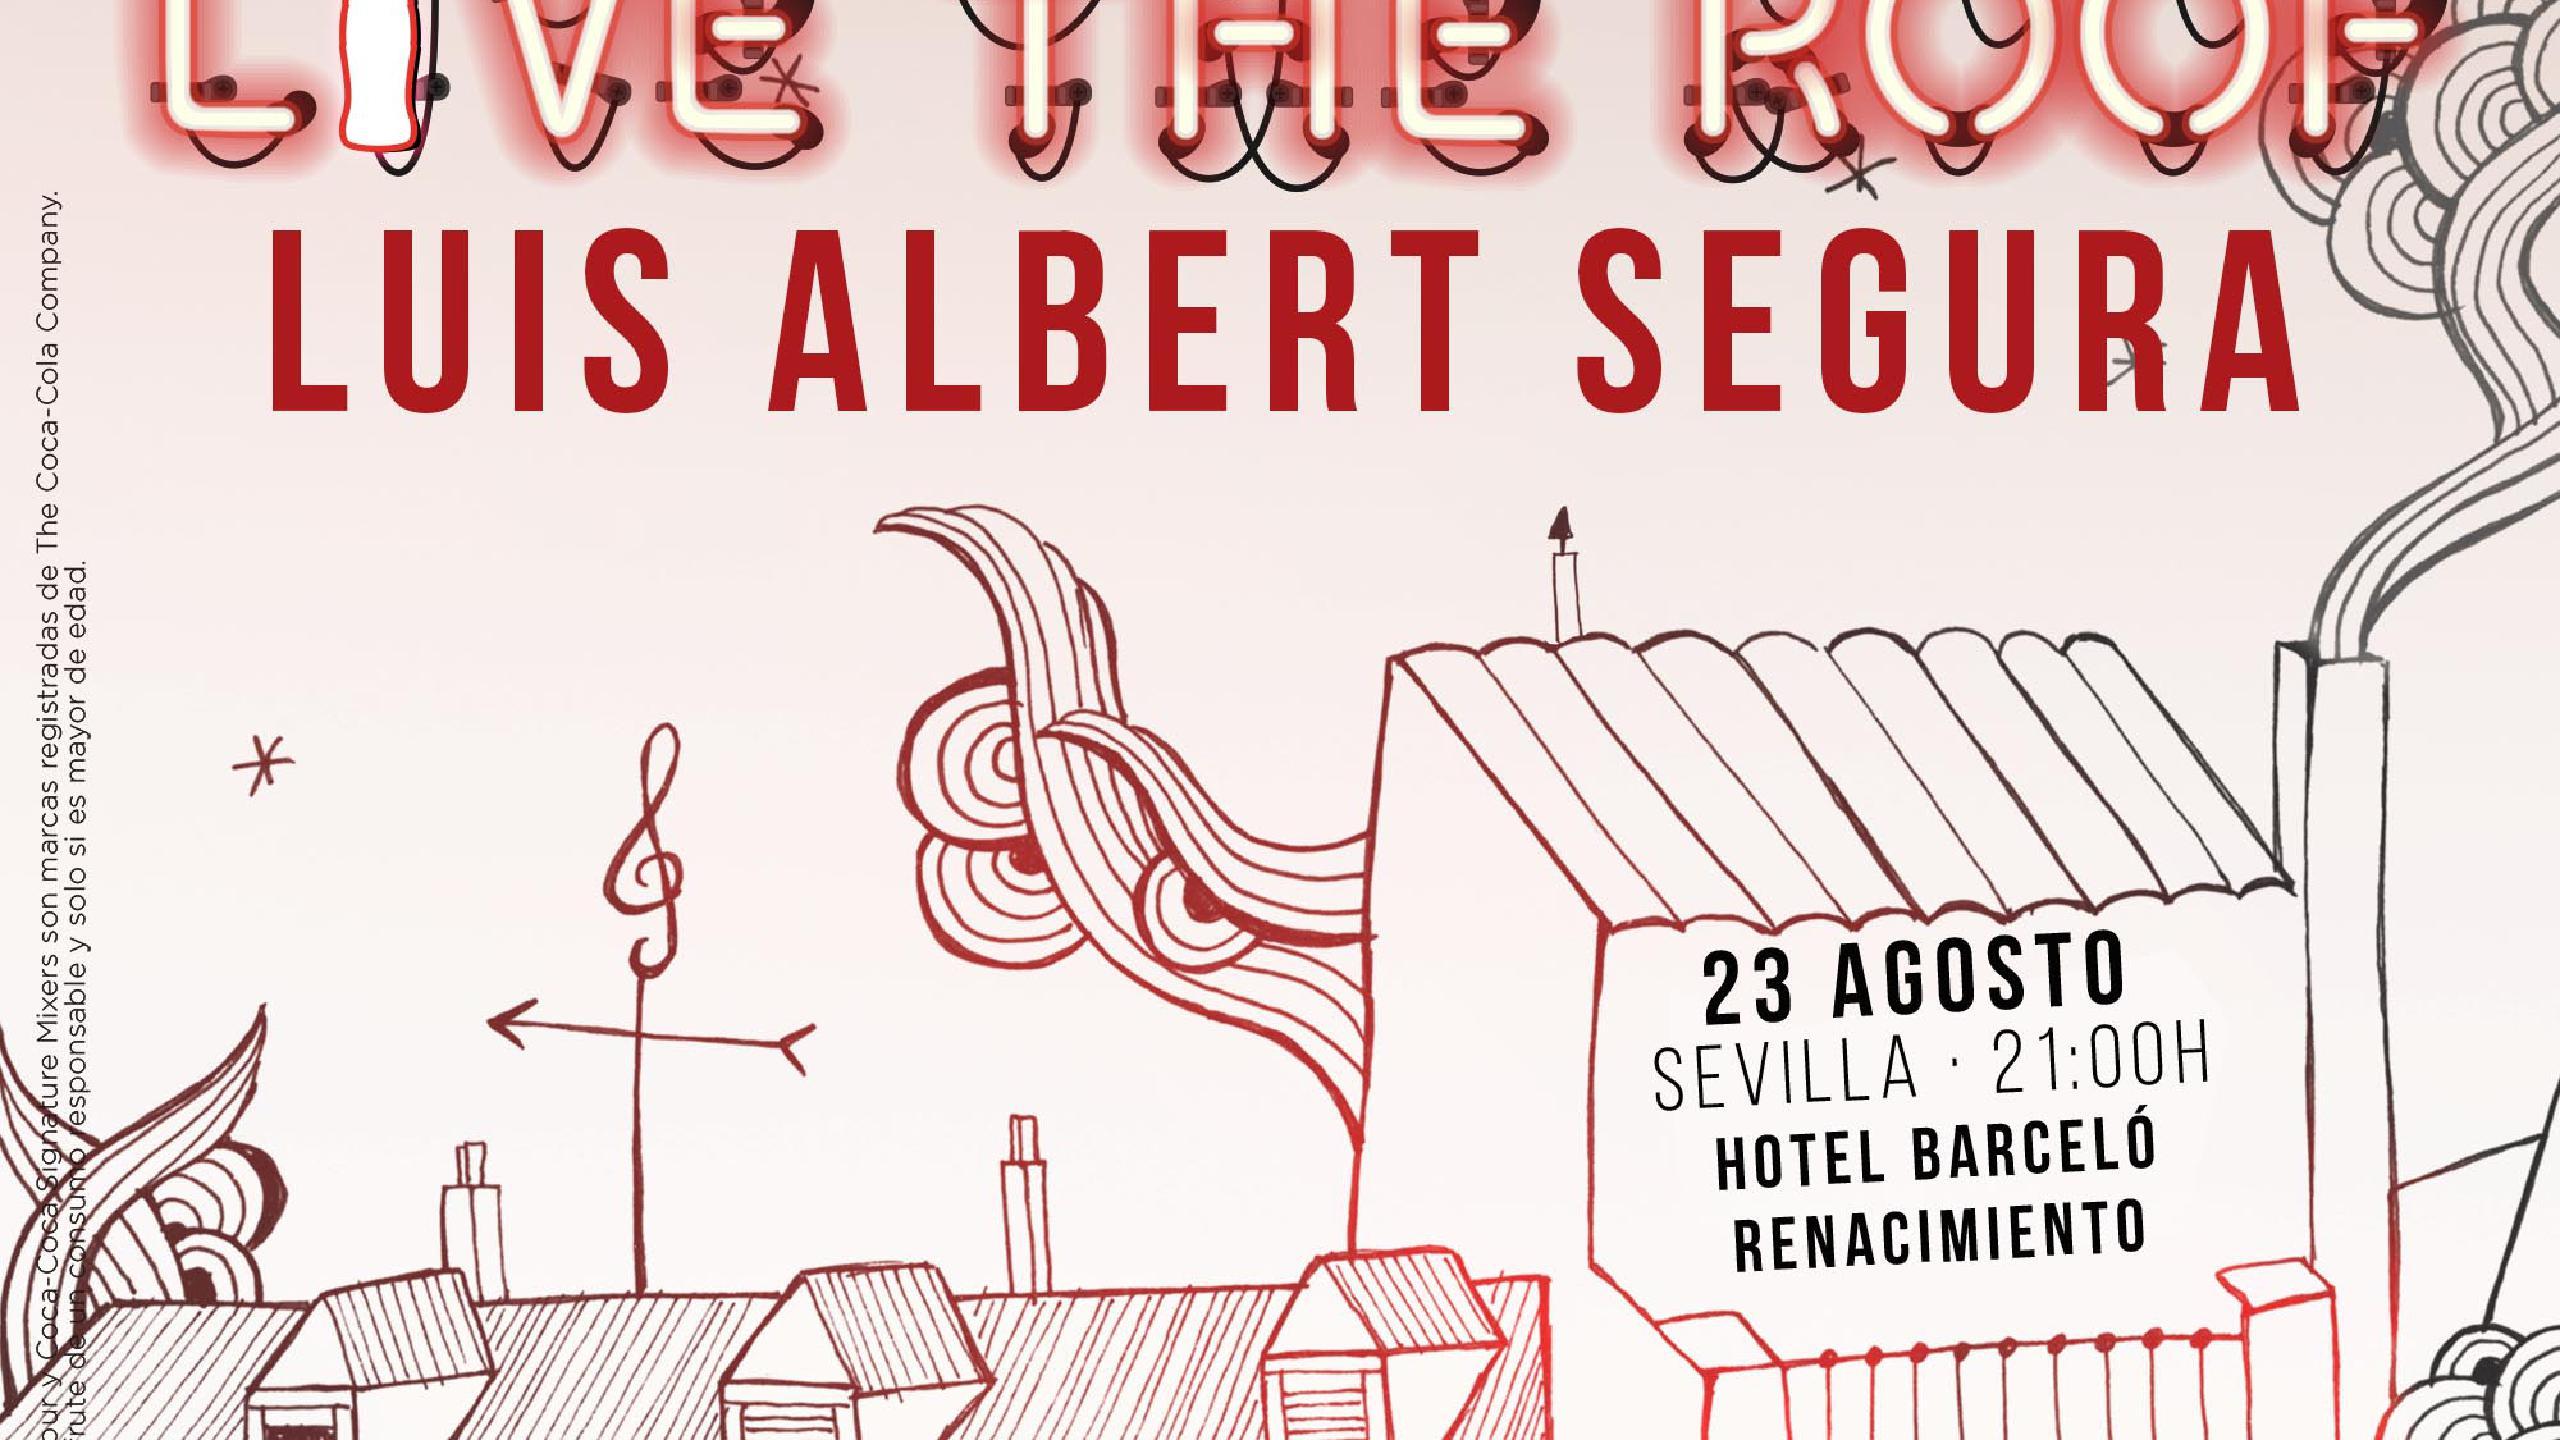 Luis Albert Segura Concert Tickets For Hotel Barceló